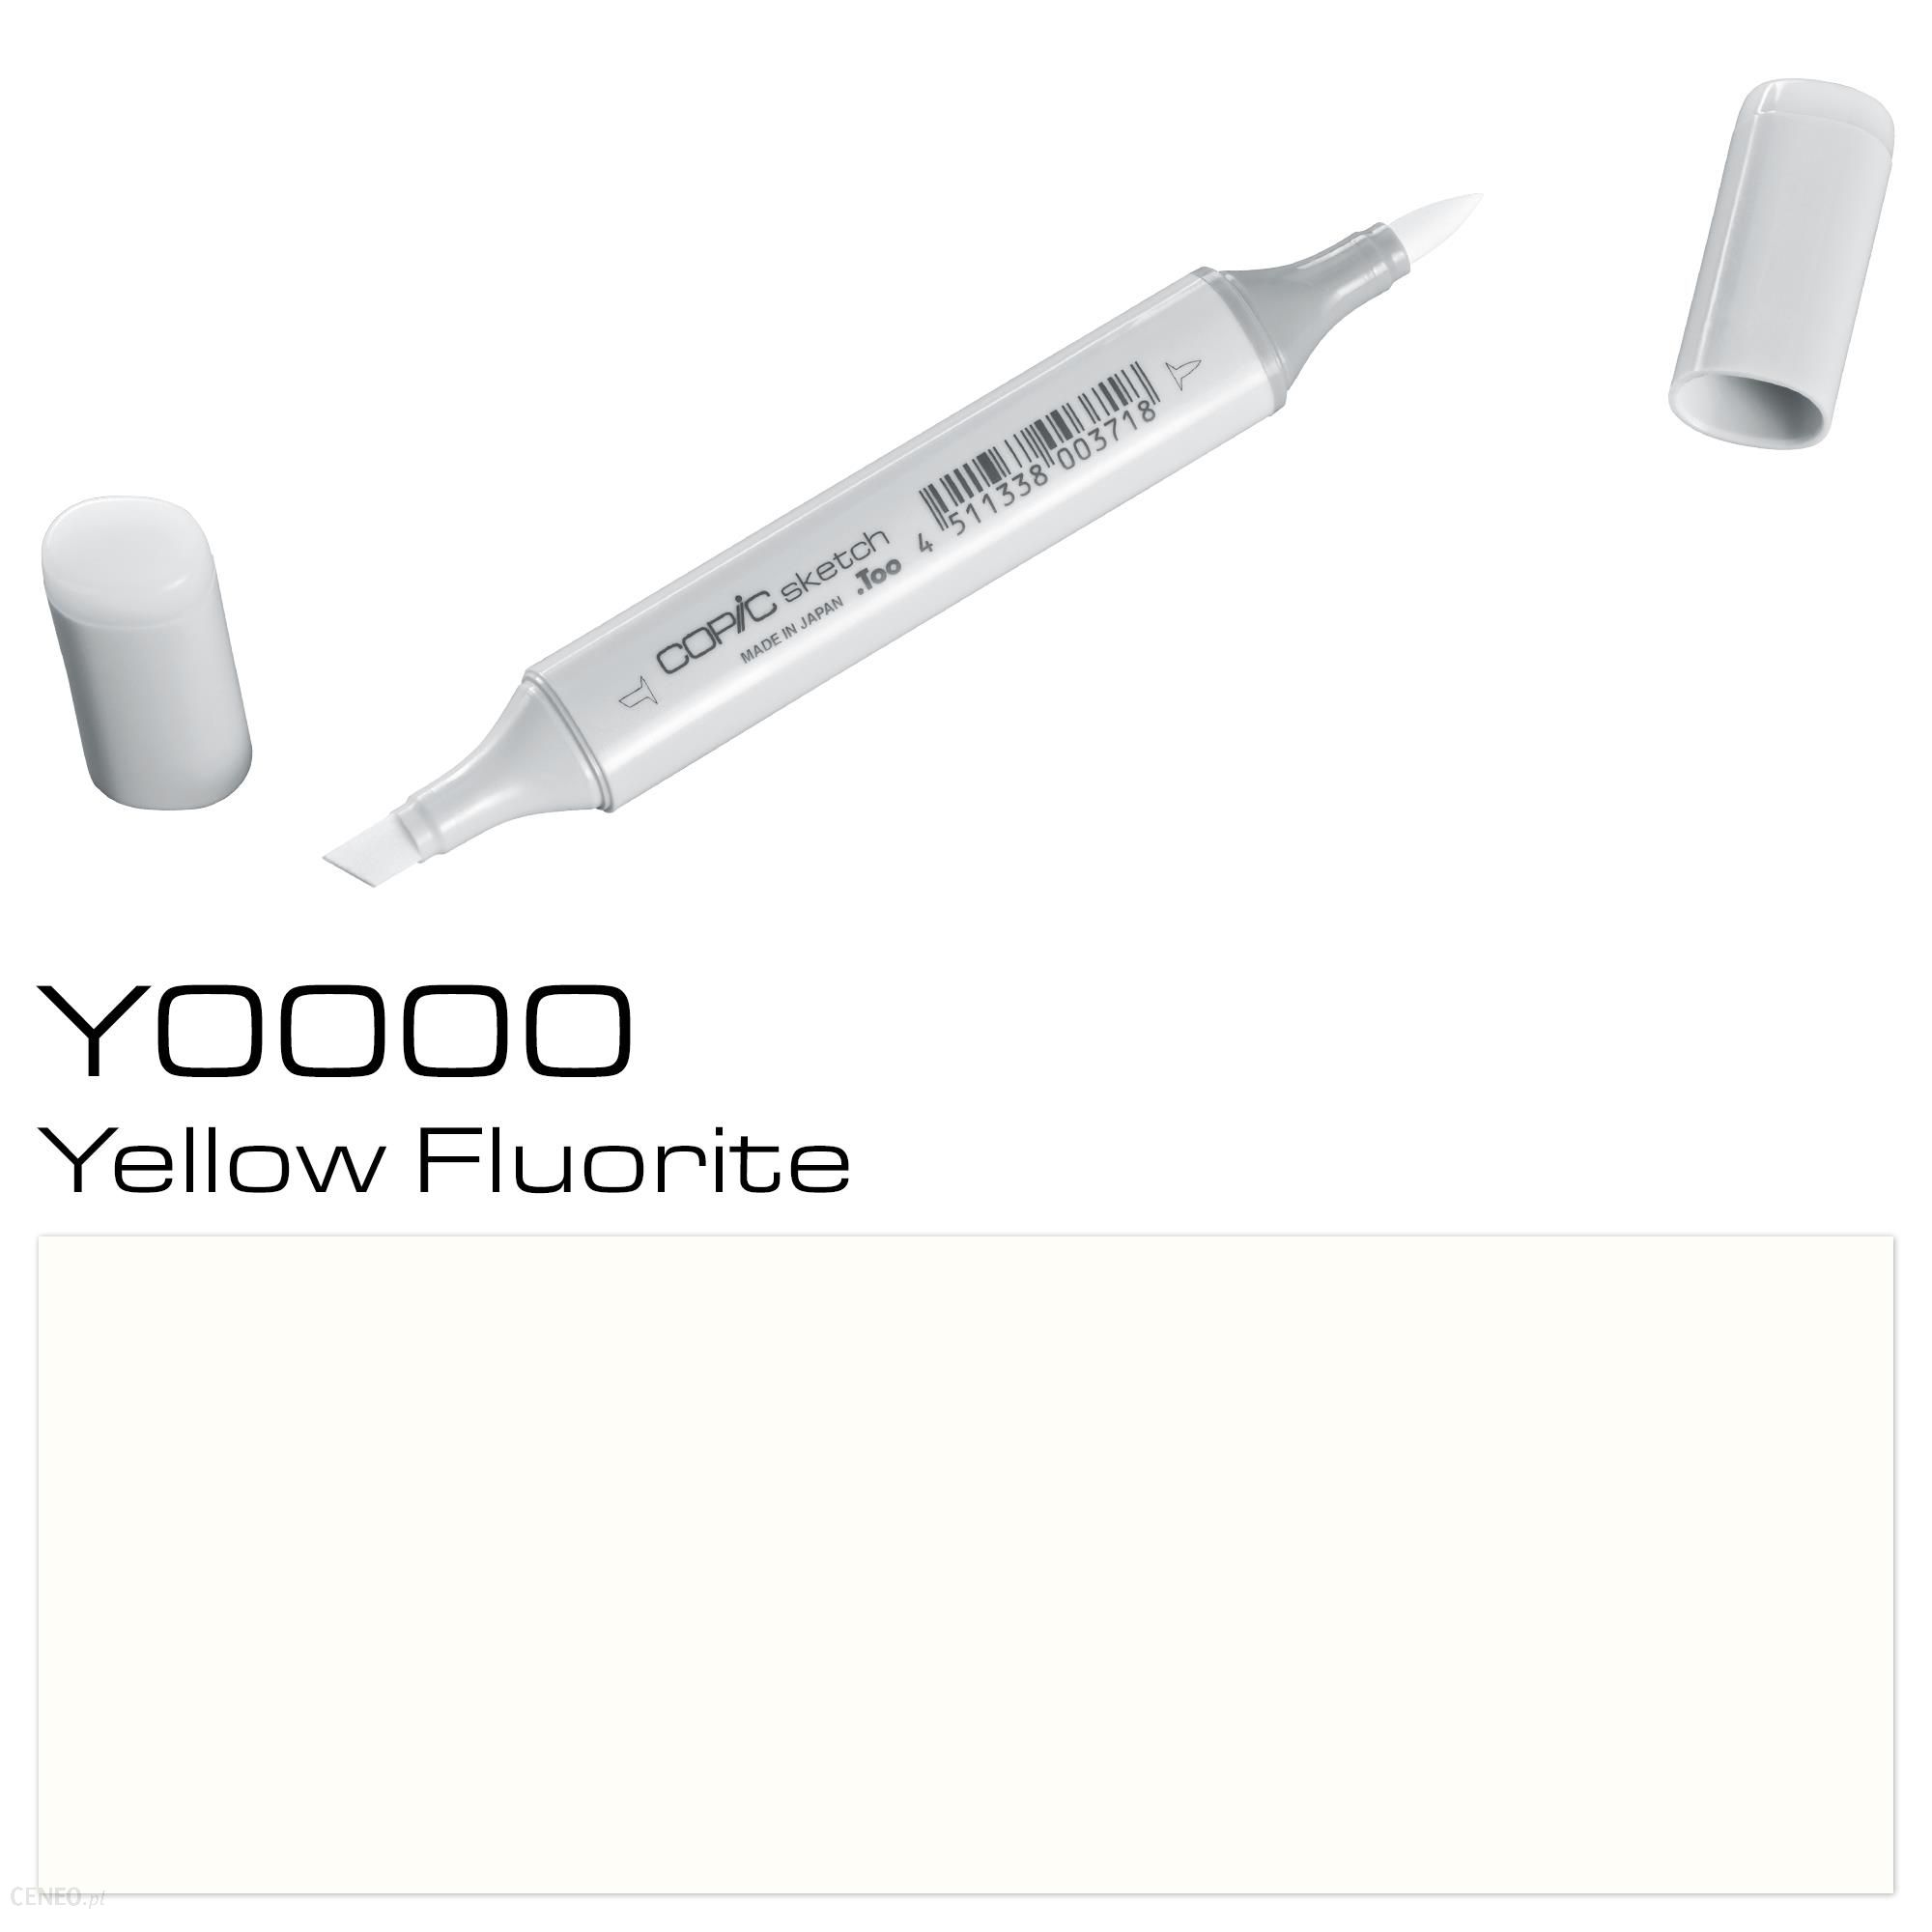 COPIC Sketch - Y0000 - Yellow Fluorite